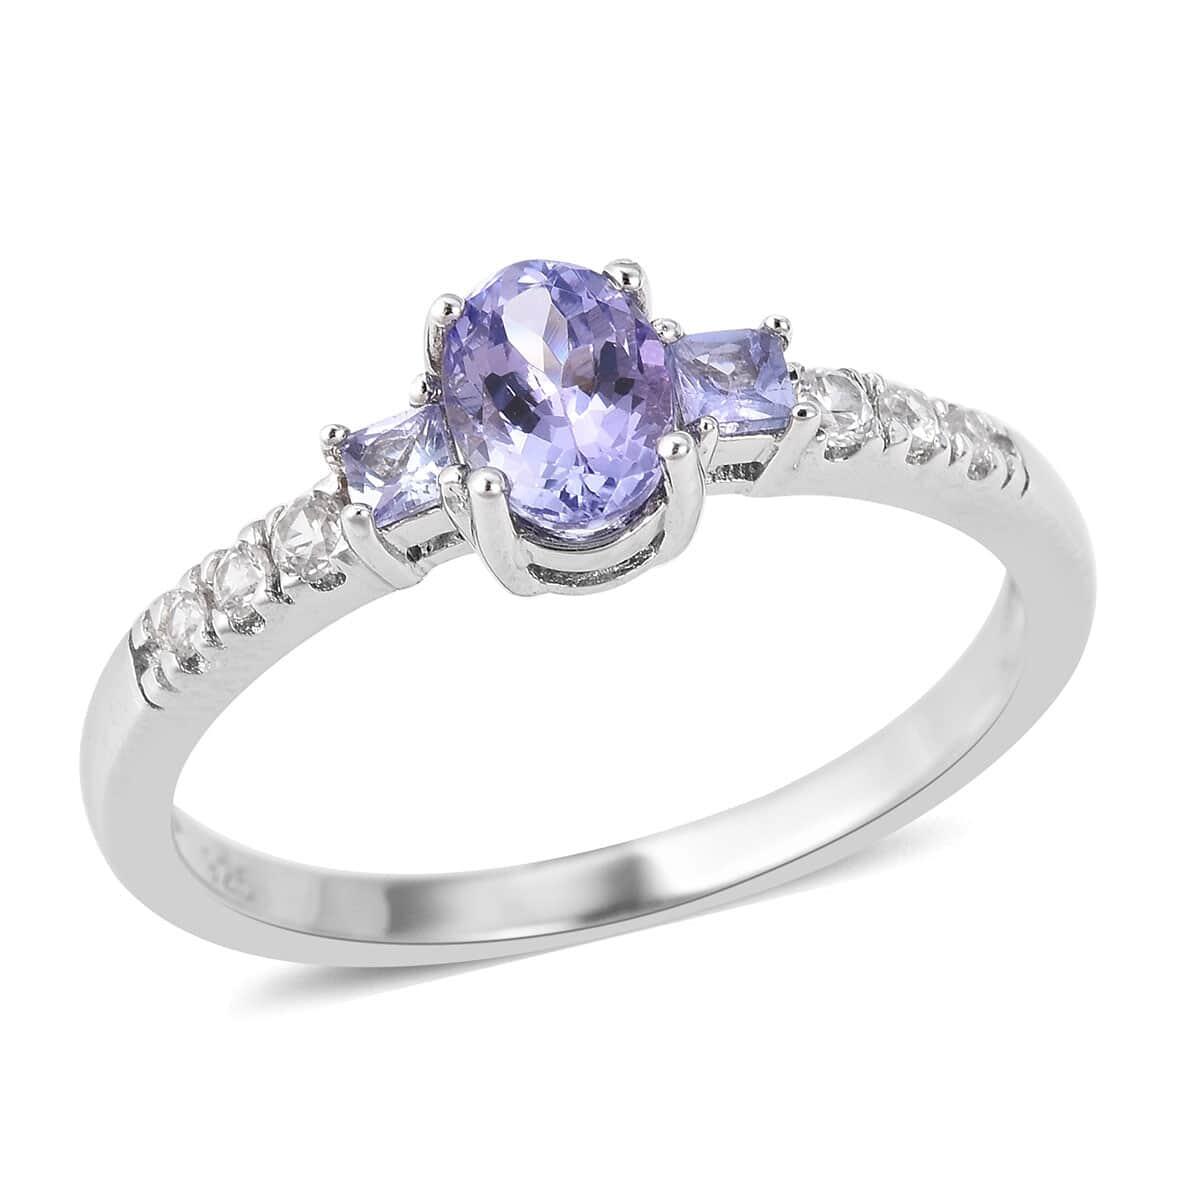 0.75cts Genuine Tanzanite /& Cubic Zirconia 925 Silver Ring Jewelry s.6 TZR1063-6